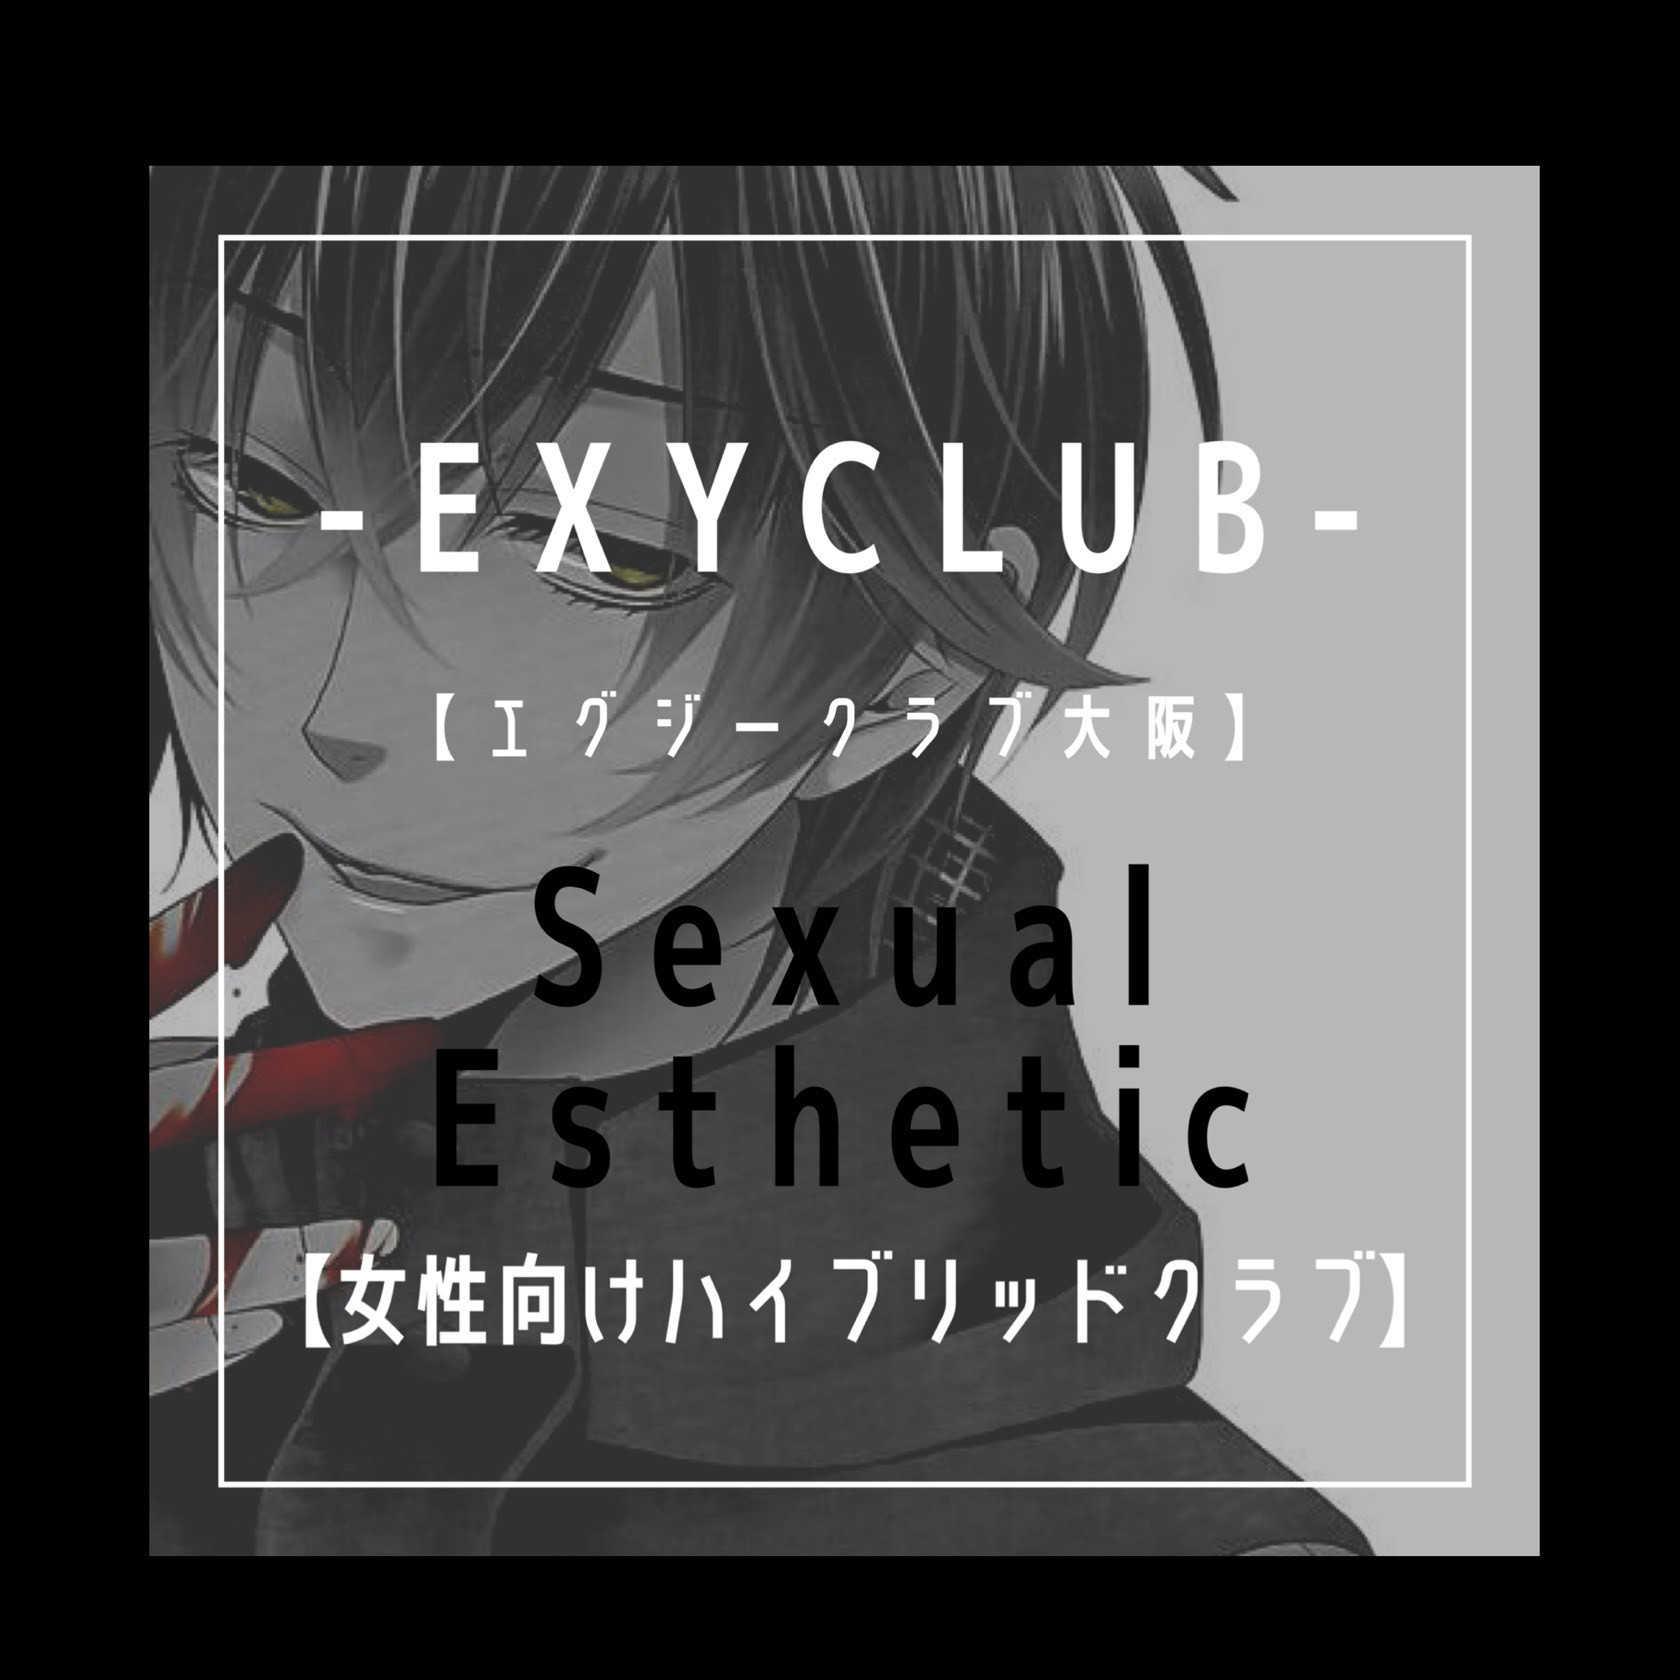 EXYCLUB